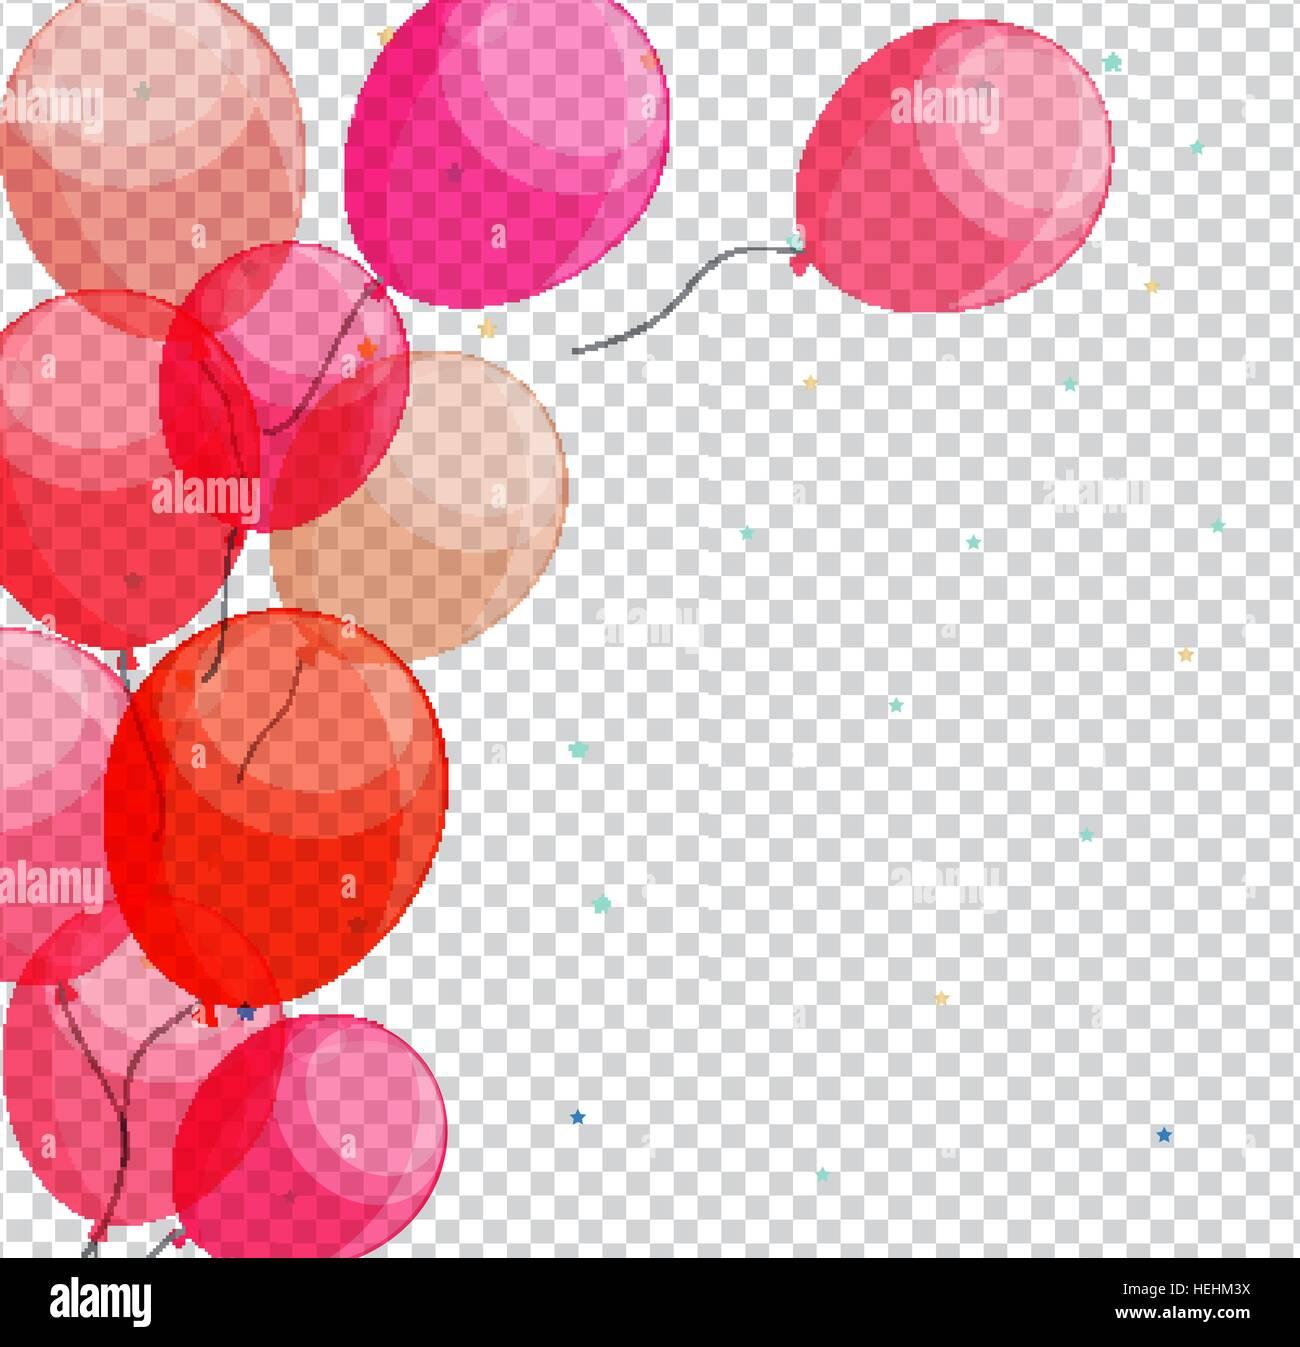 Glossy happy birthday balloons on transparent background vector stock vector art amp illustration